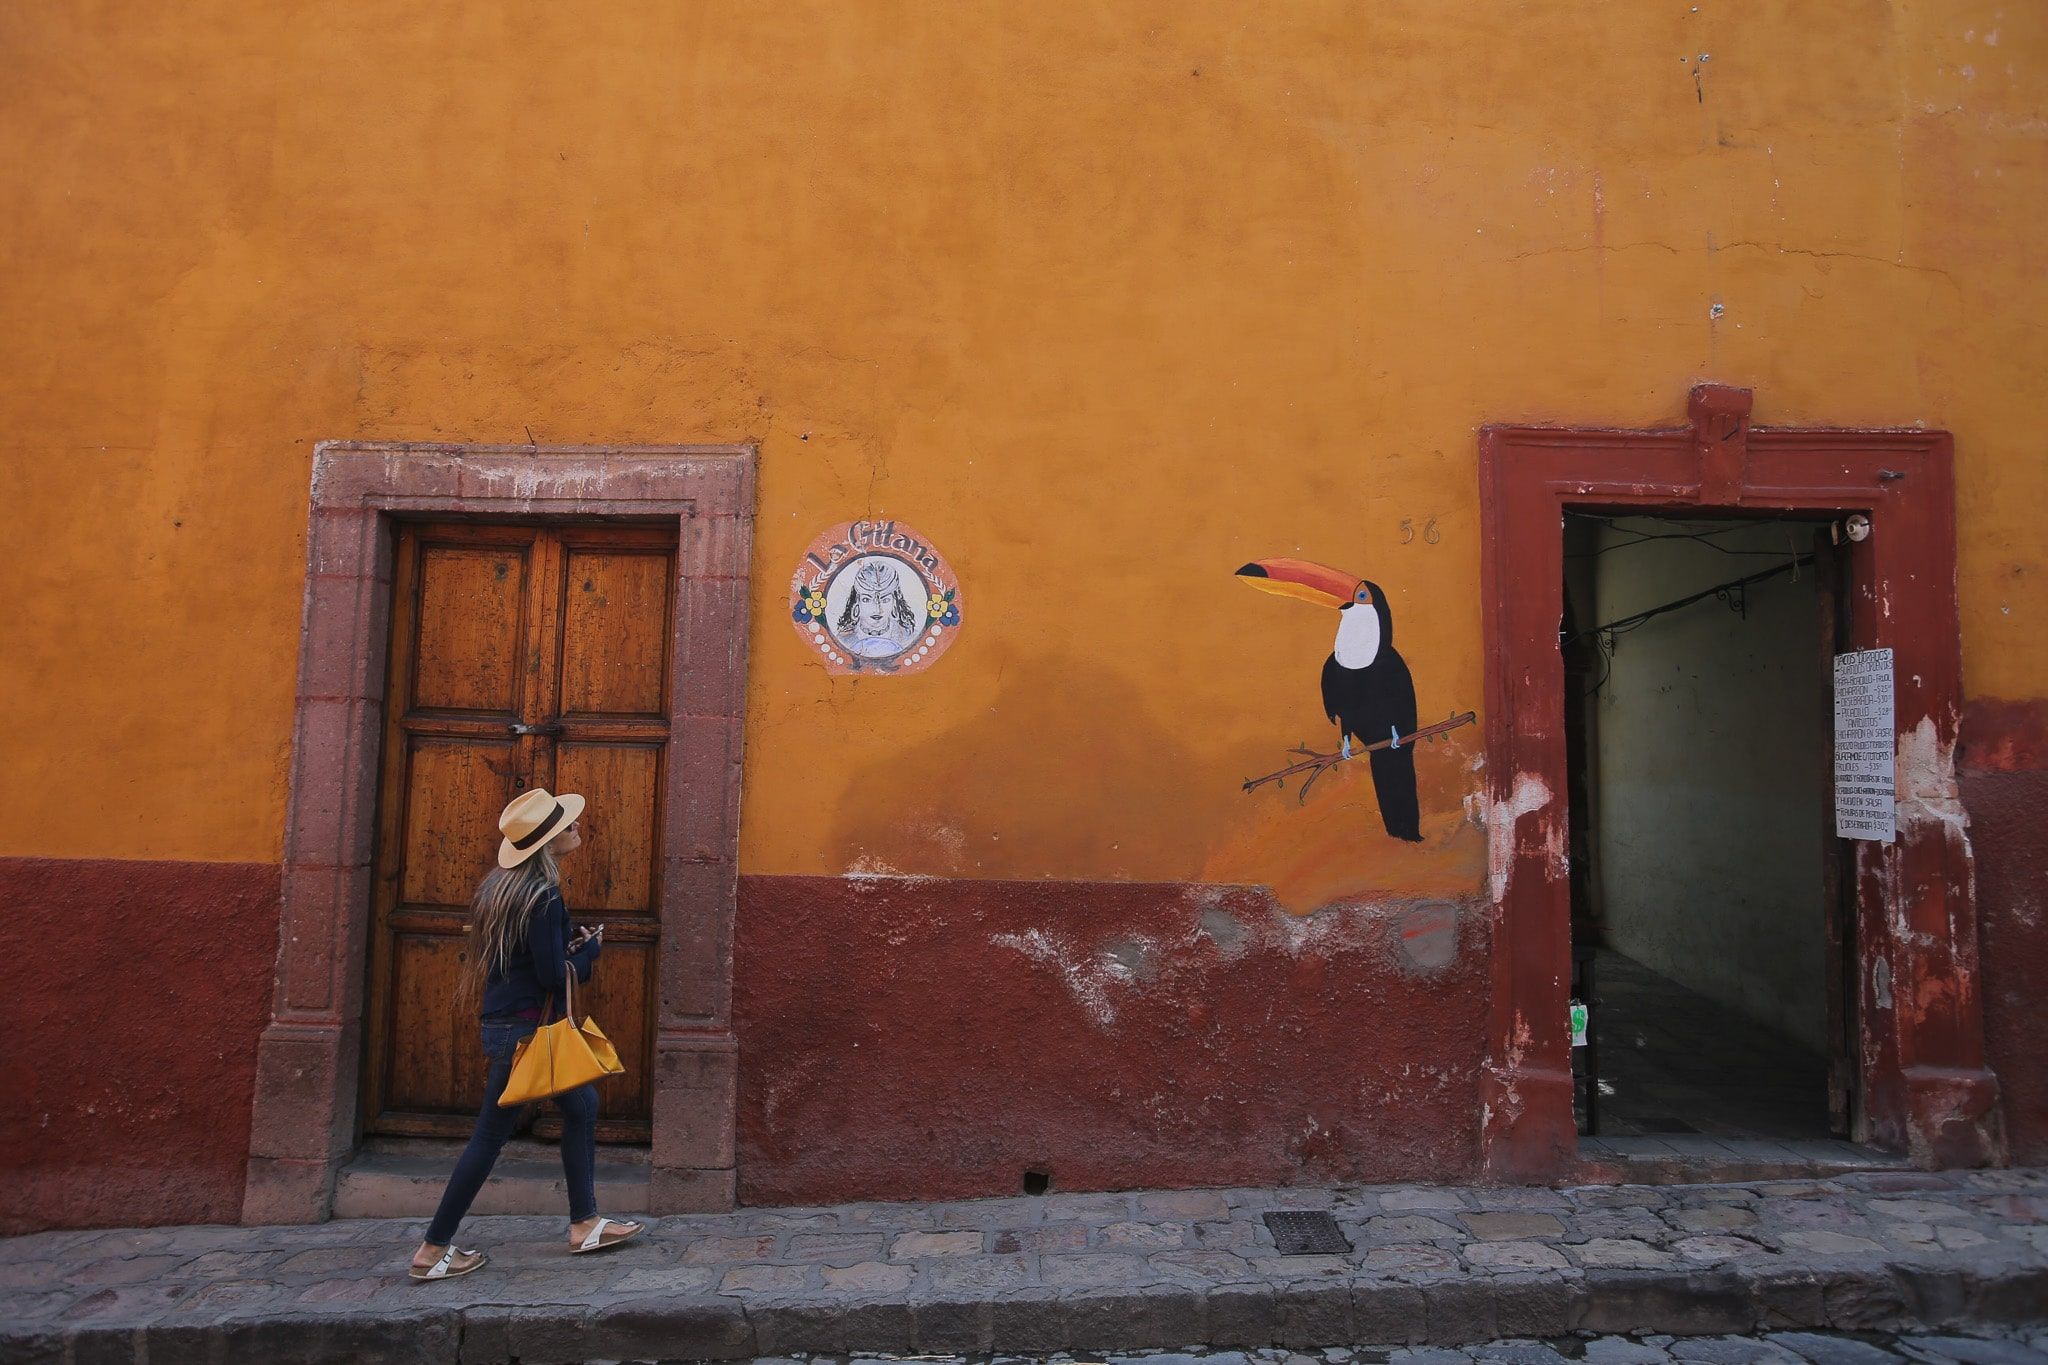 San Miguel de Allende colors